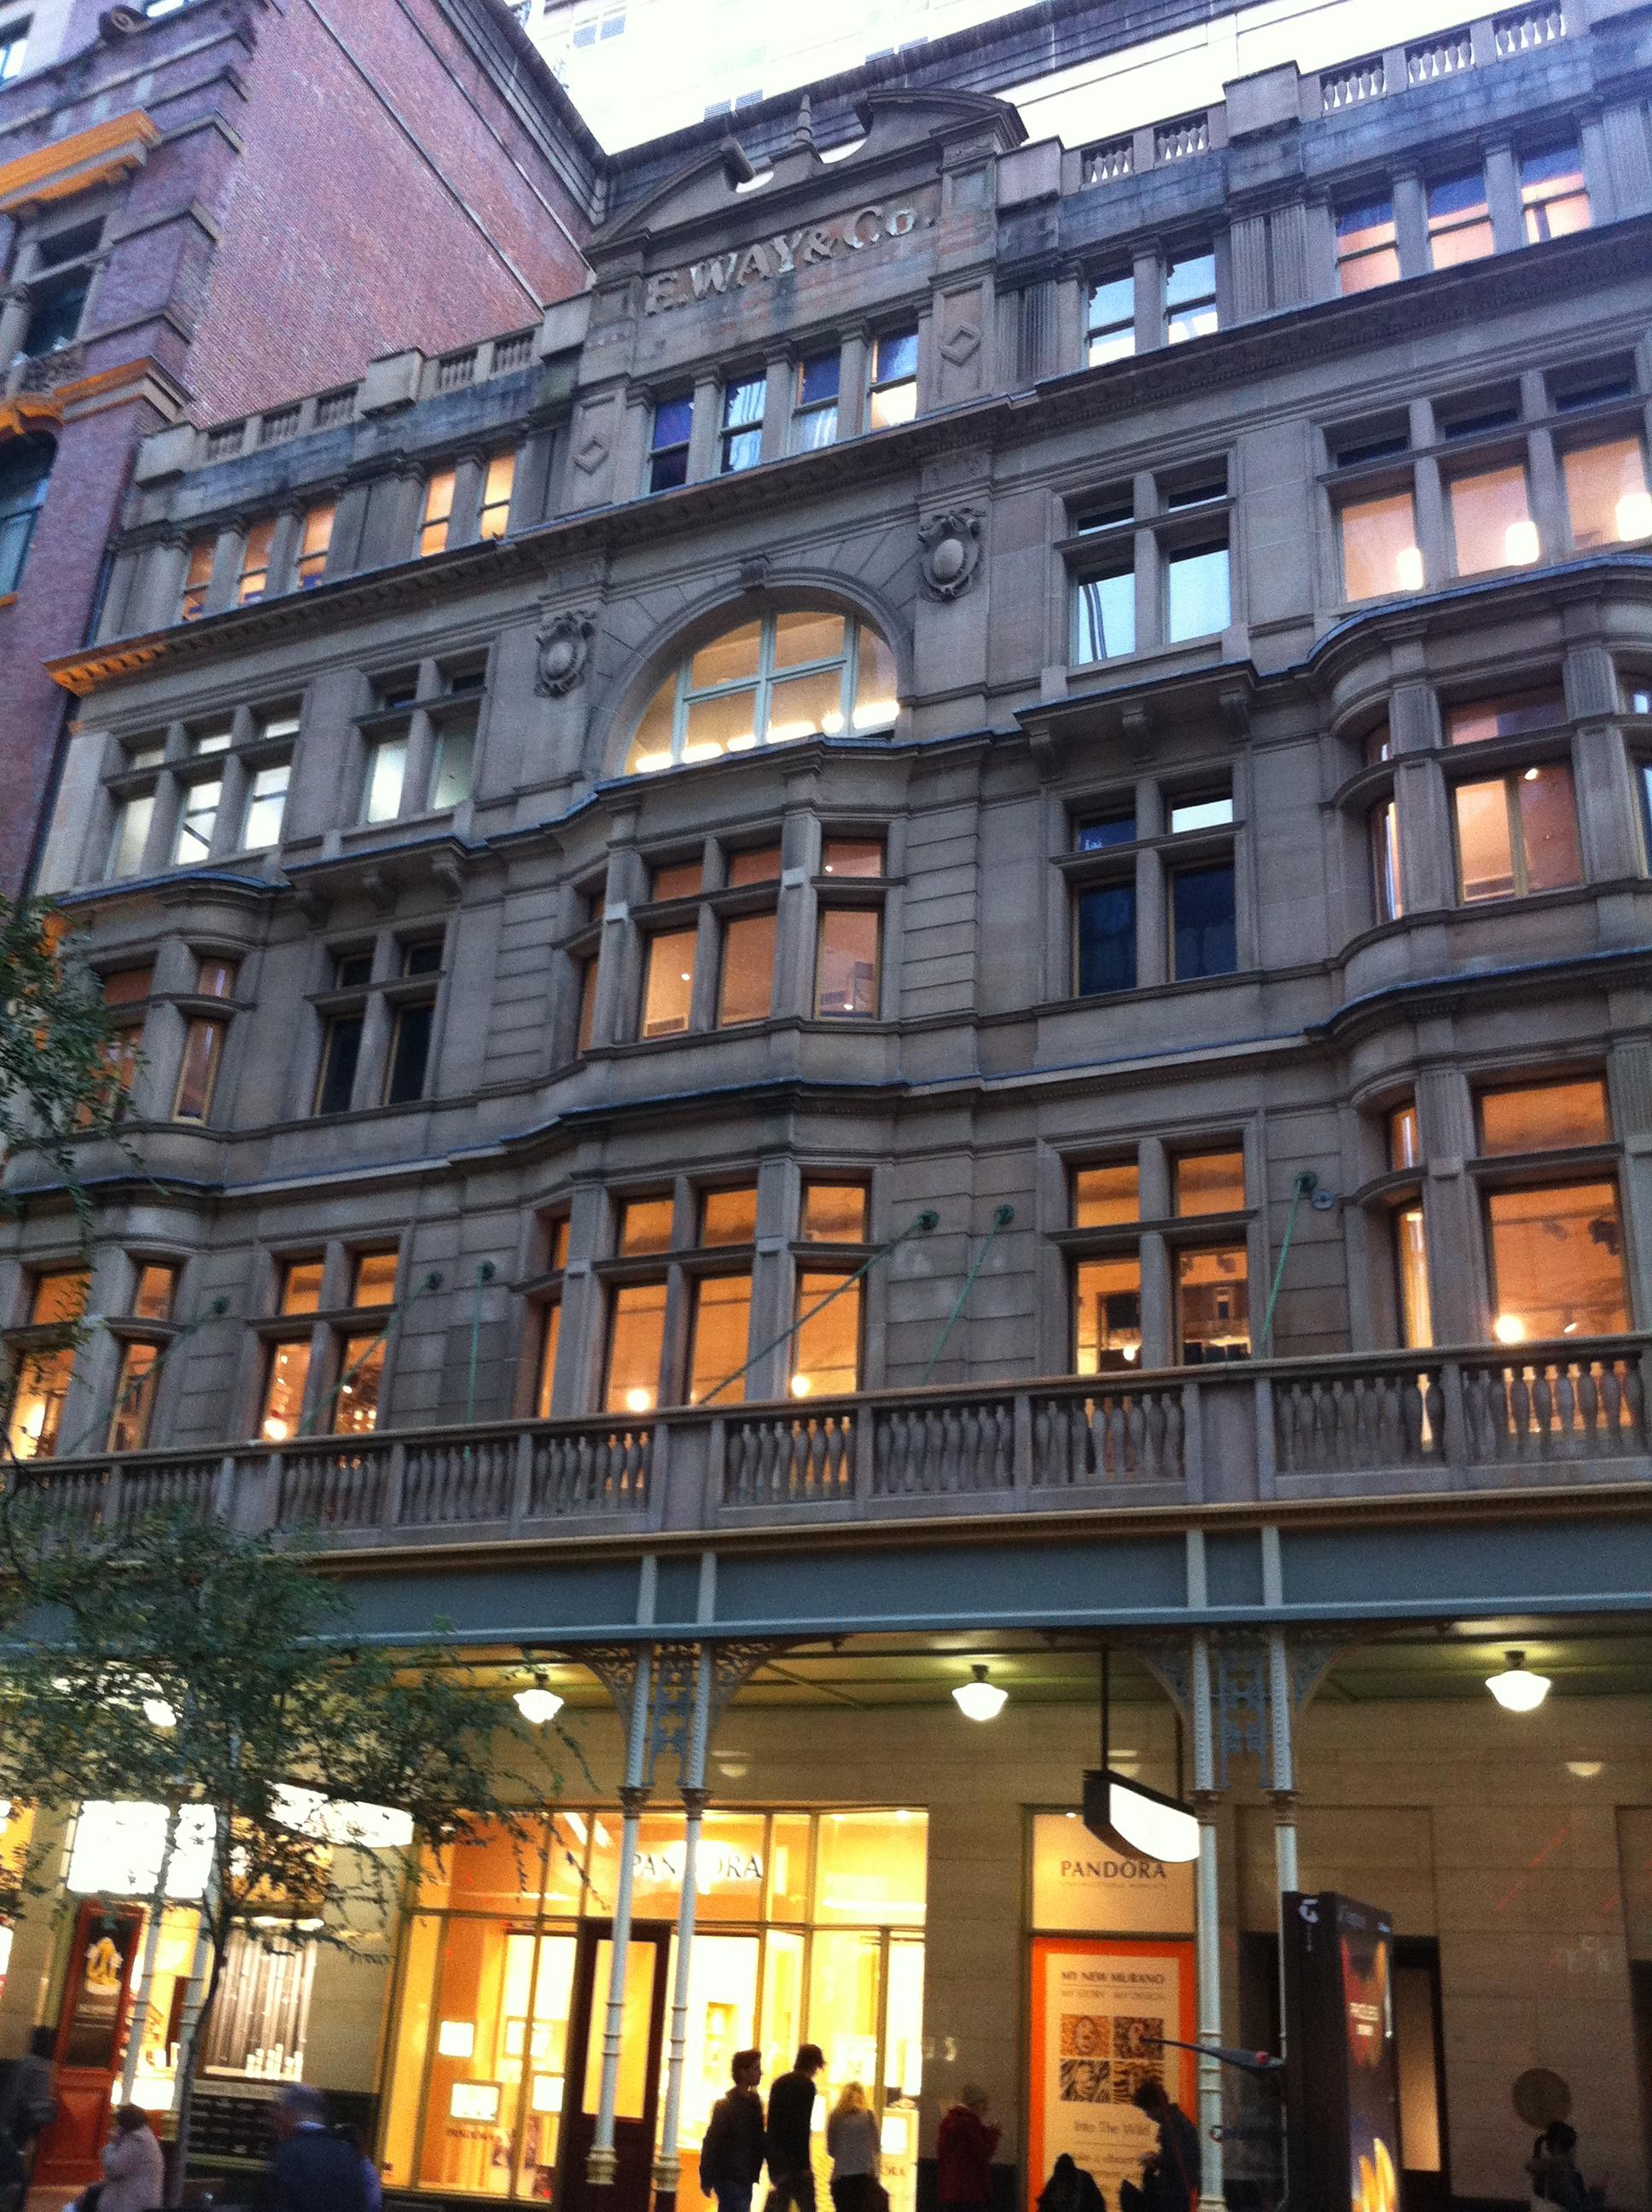 Ugg Store Pitt Street Sydney